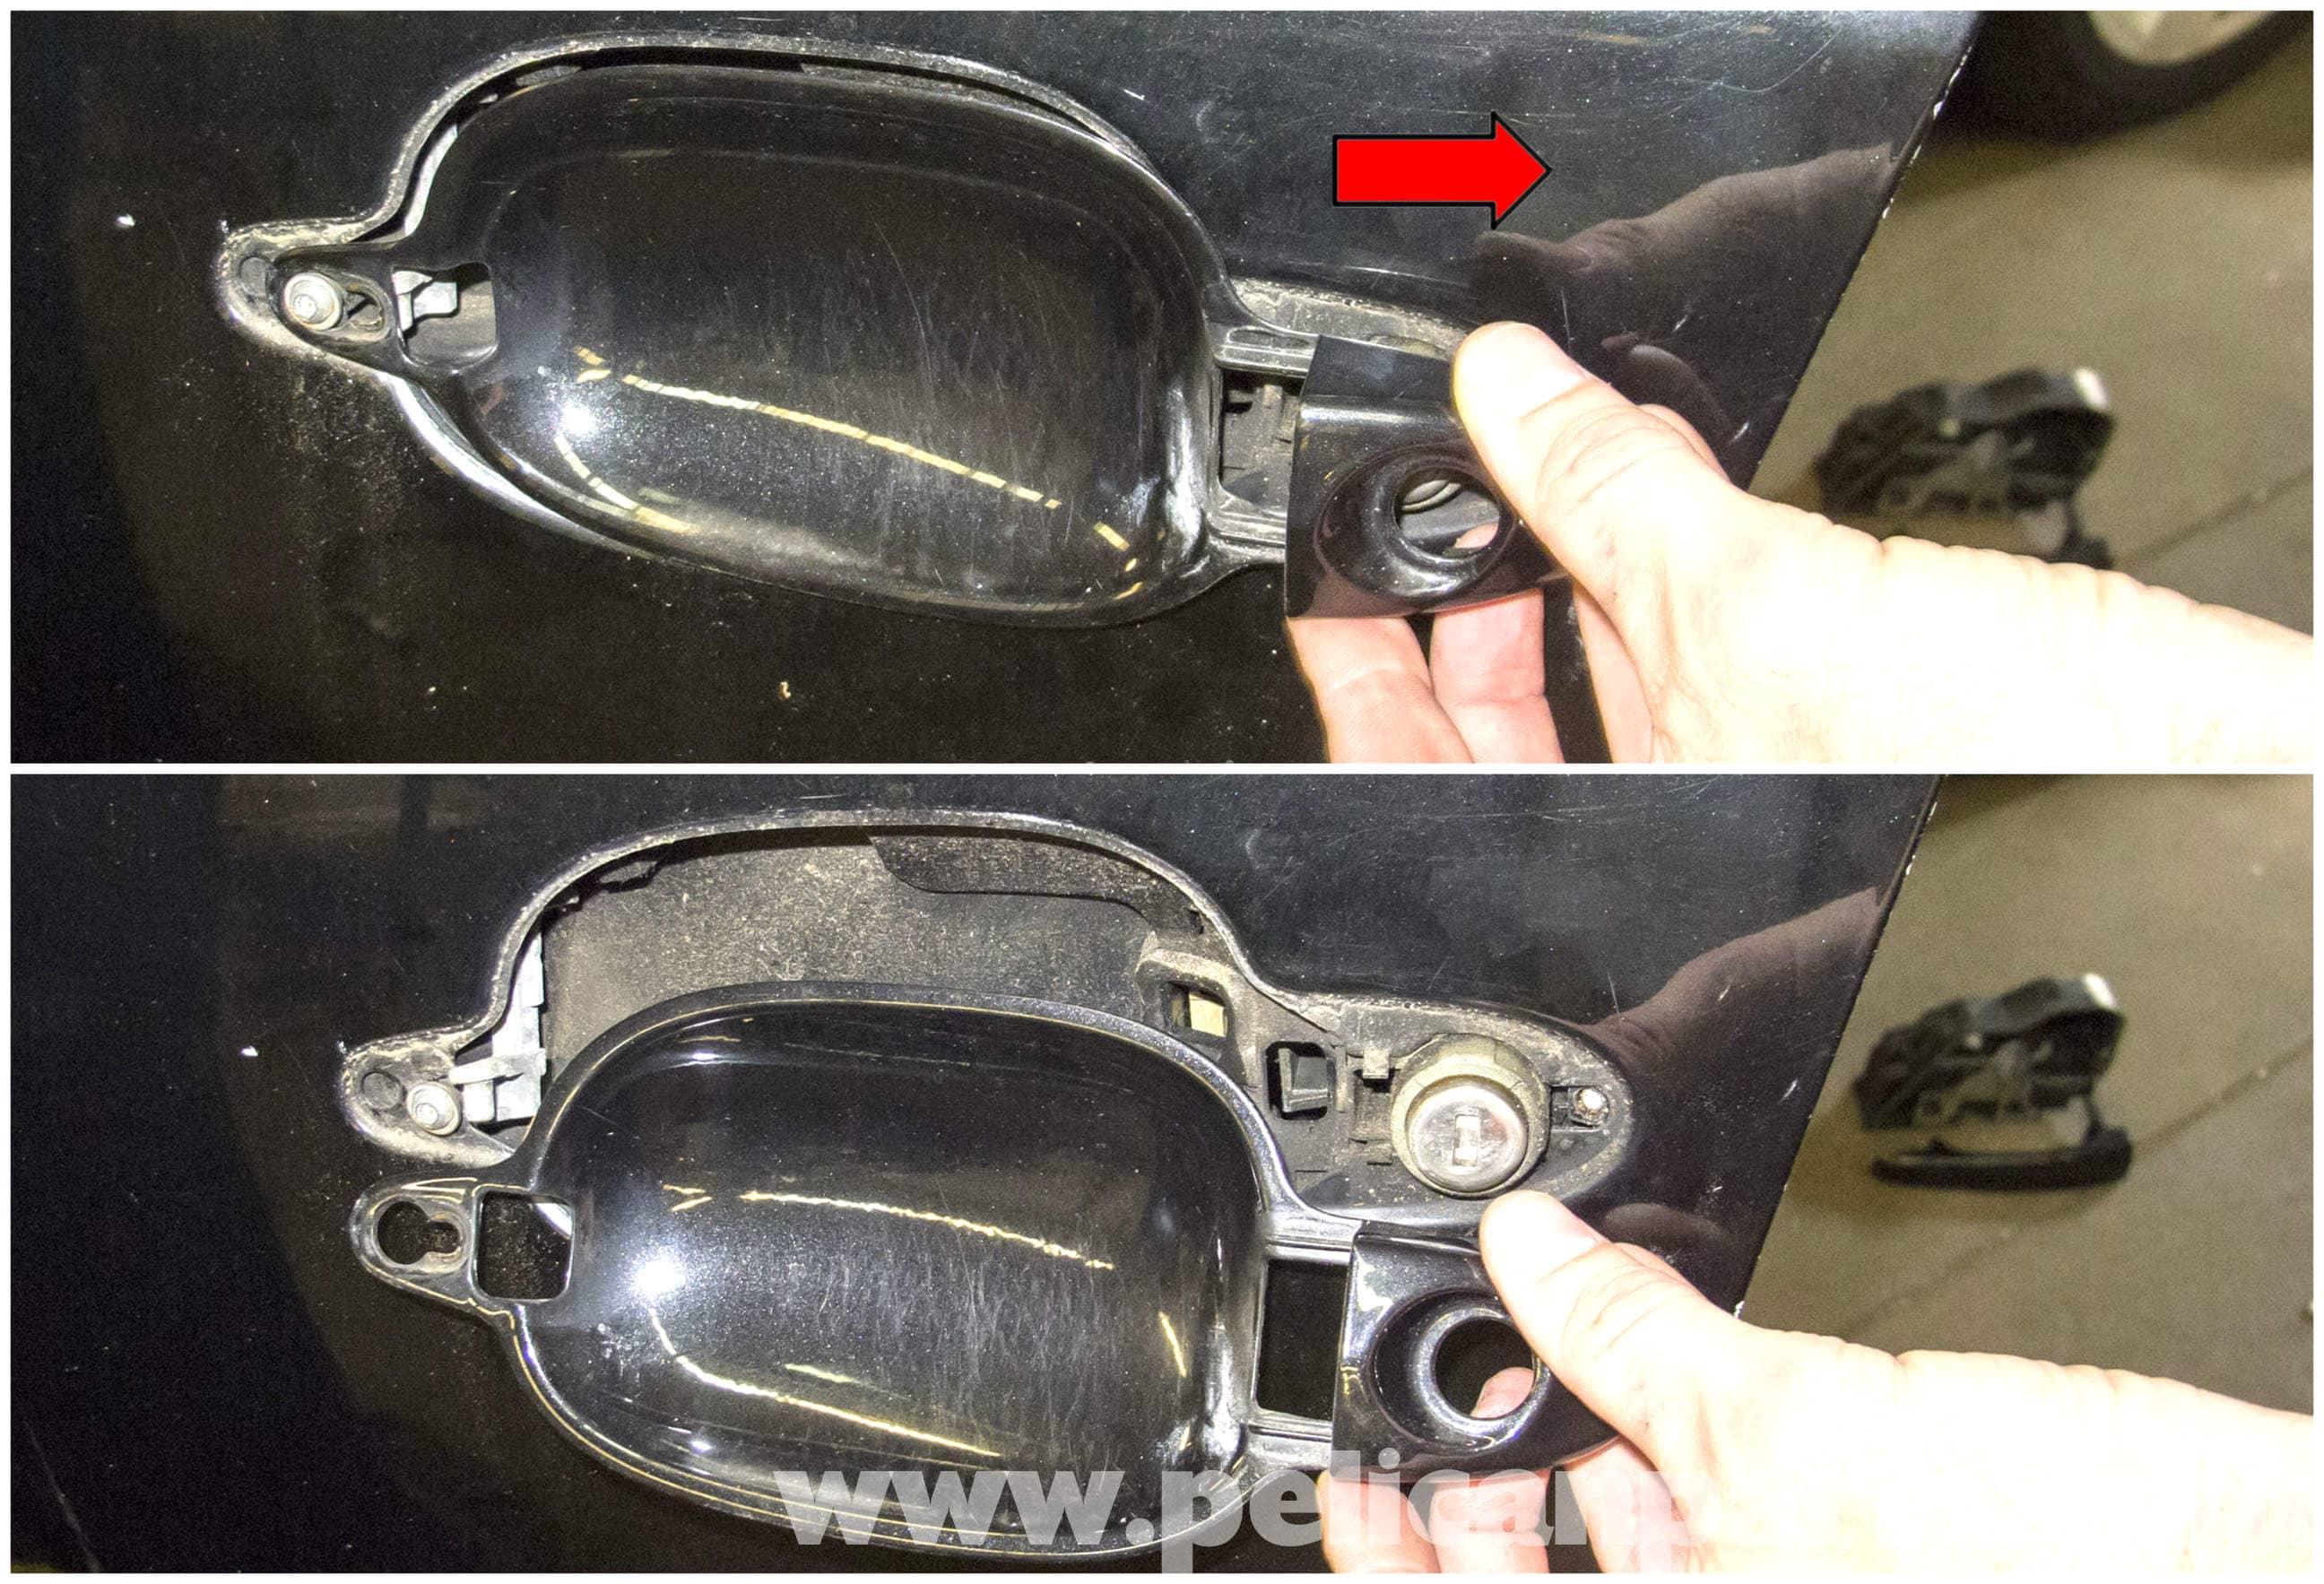 Bmw E60 5 Series Door Handle Replacement 2003 2010 Pelican Parts Technical Article